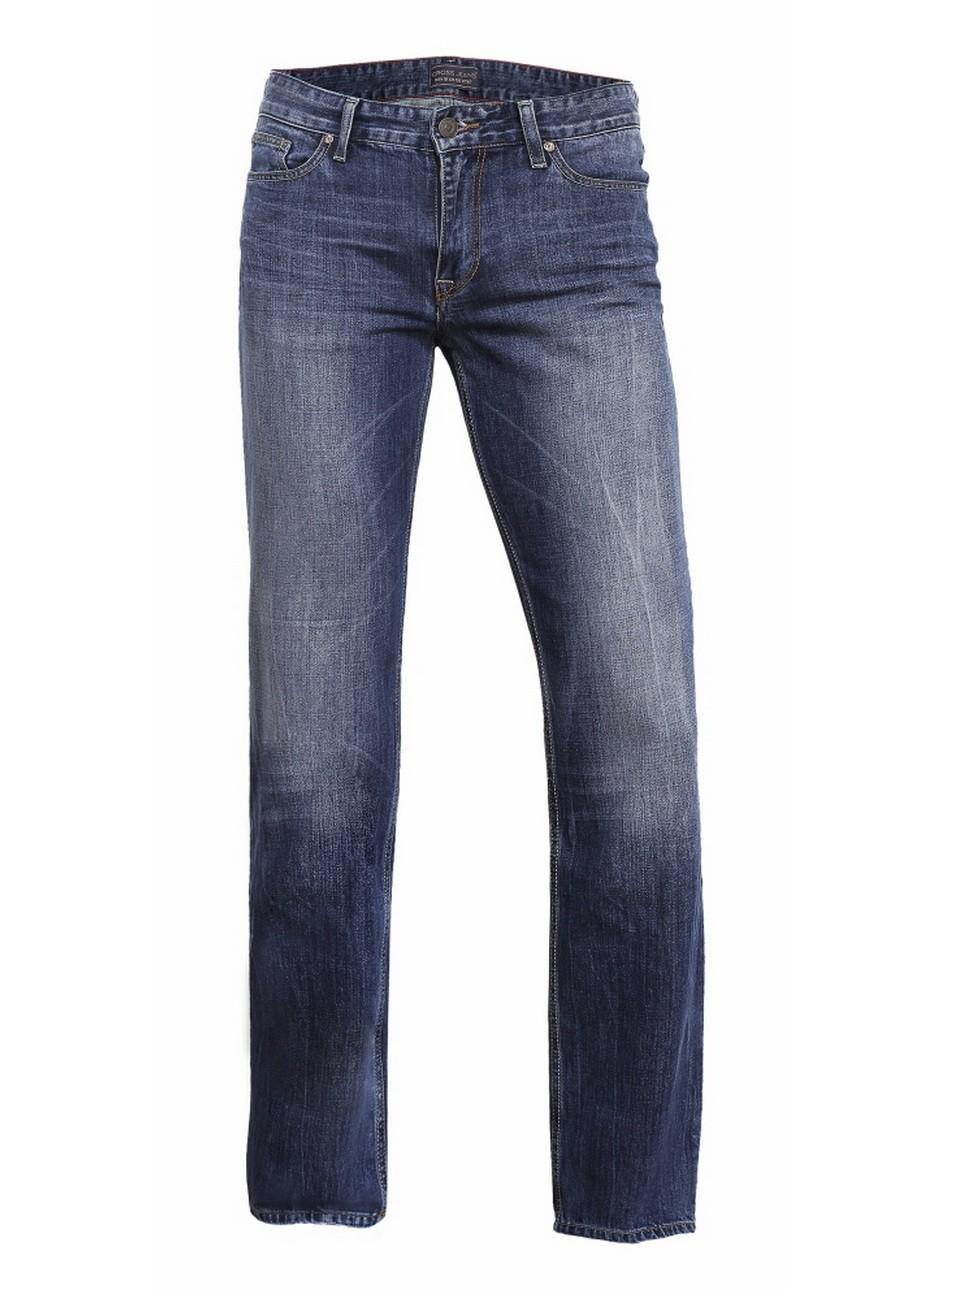 cross herren jeans antonio e161 009 relax fit deep blue worn out ebay. Black Bedroom Furniture Sets. Home Design Ideas